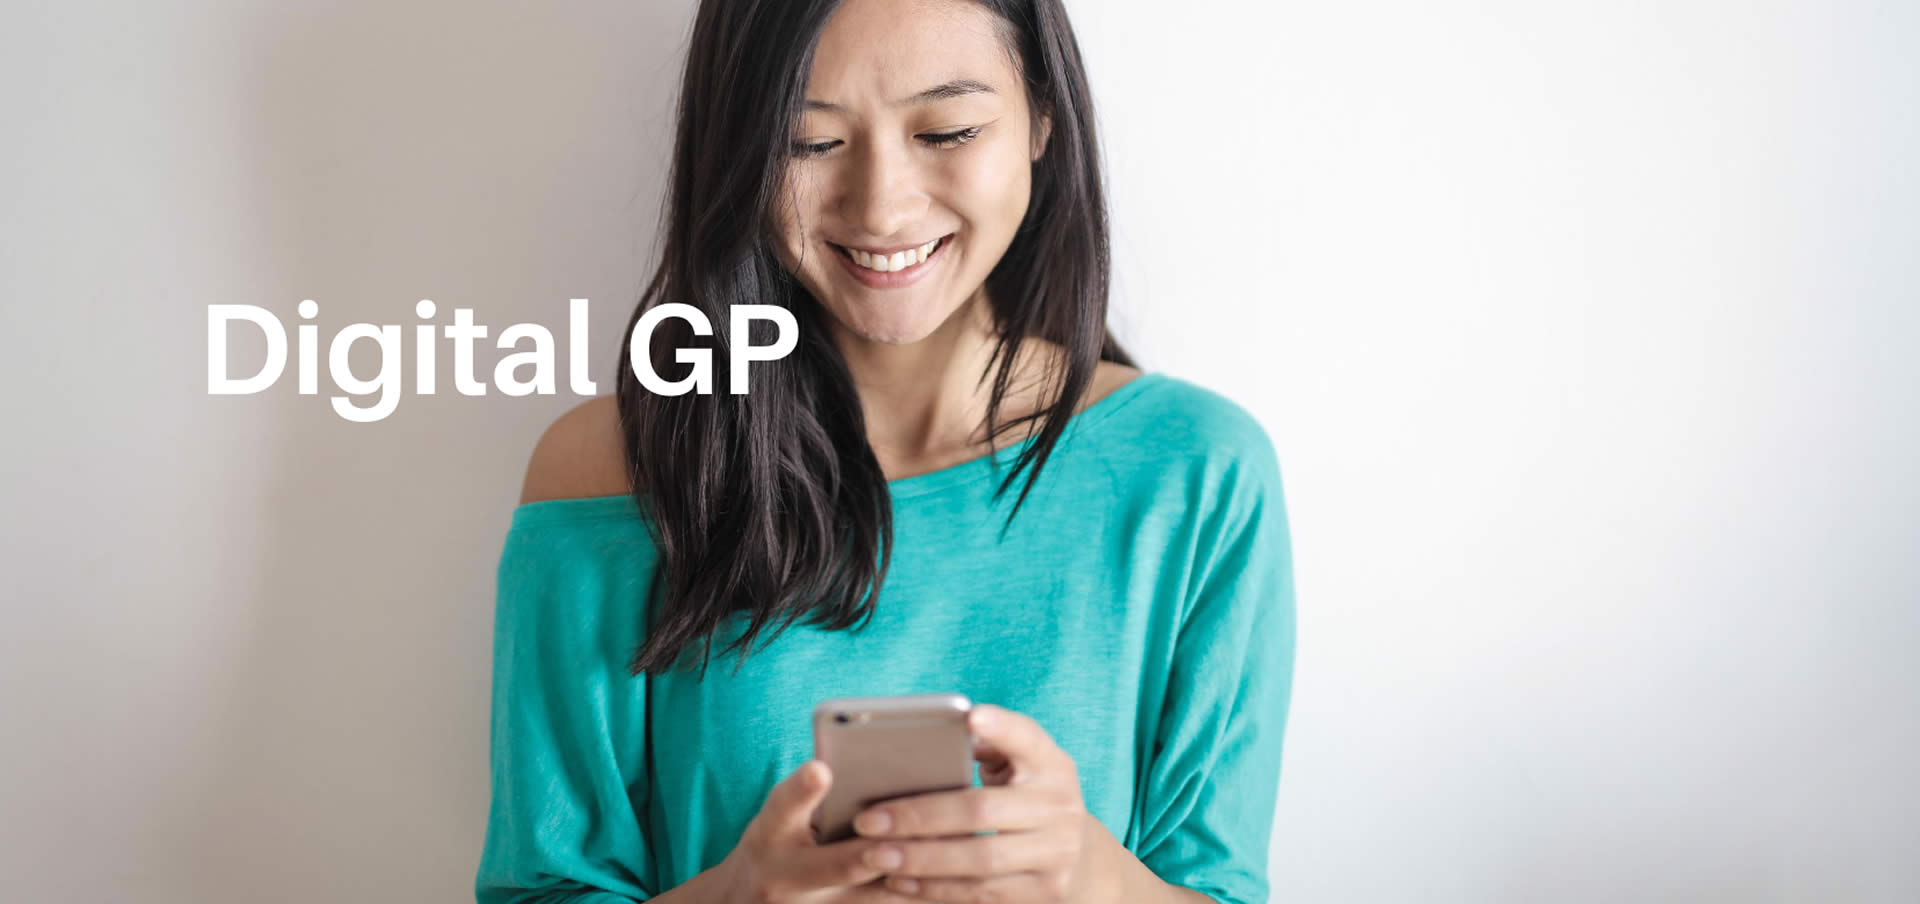 Digital GP